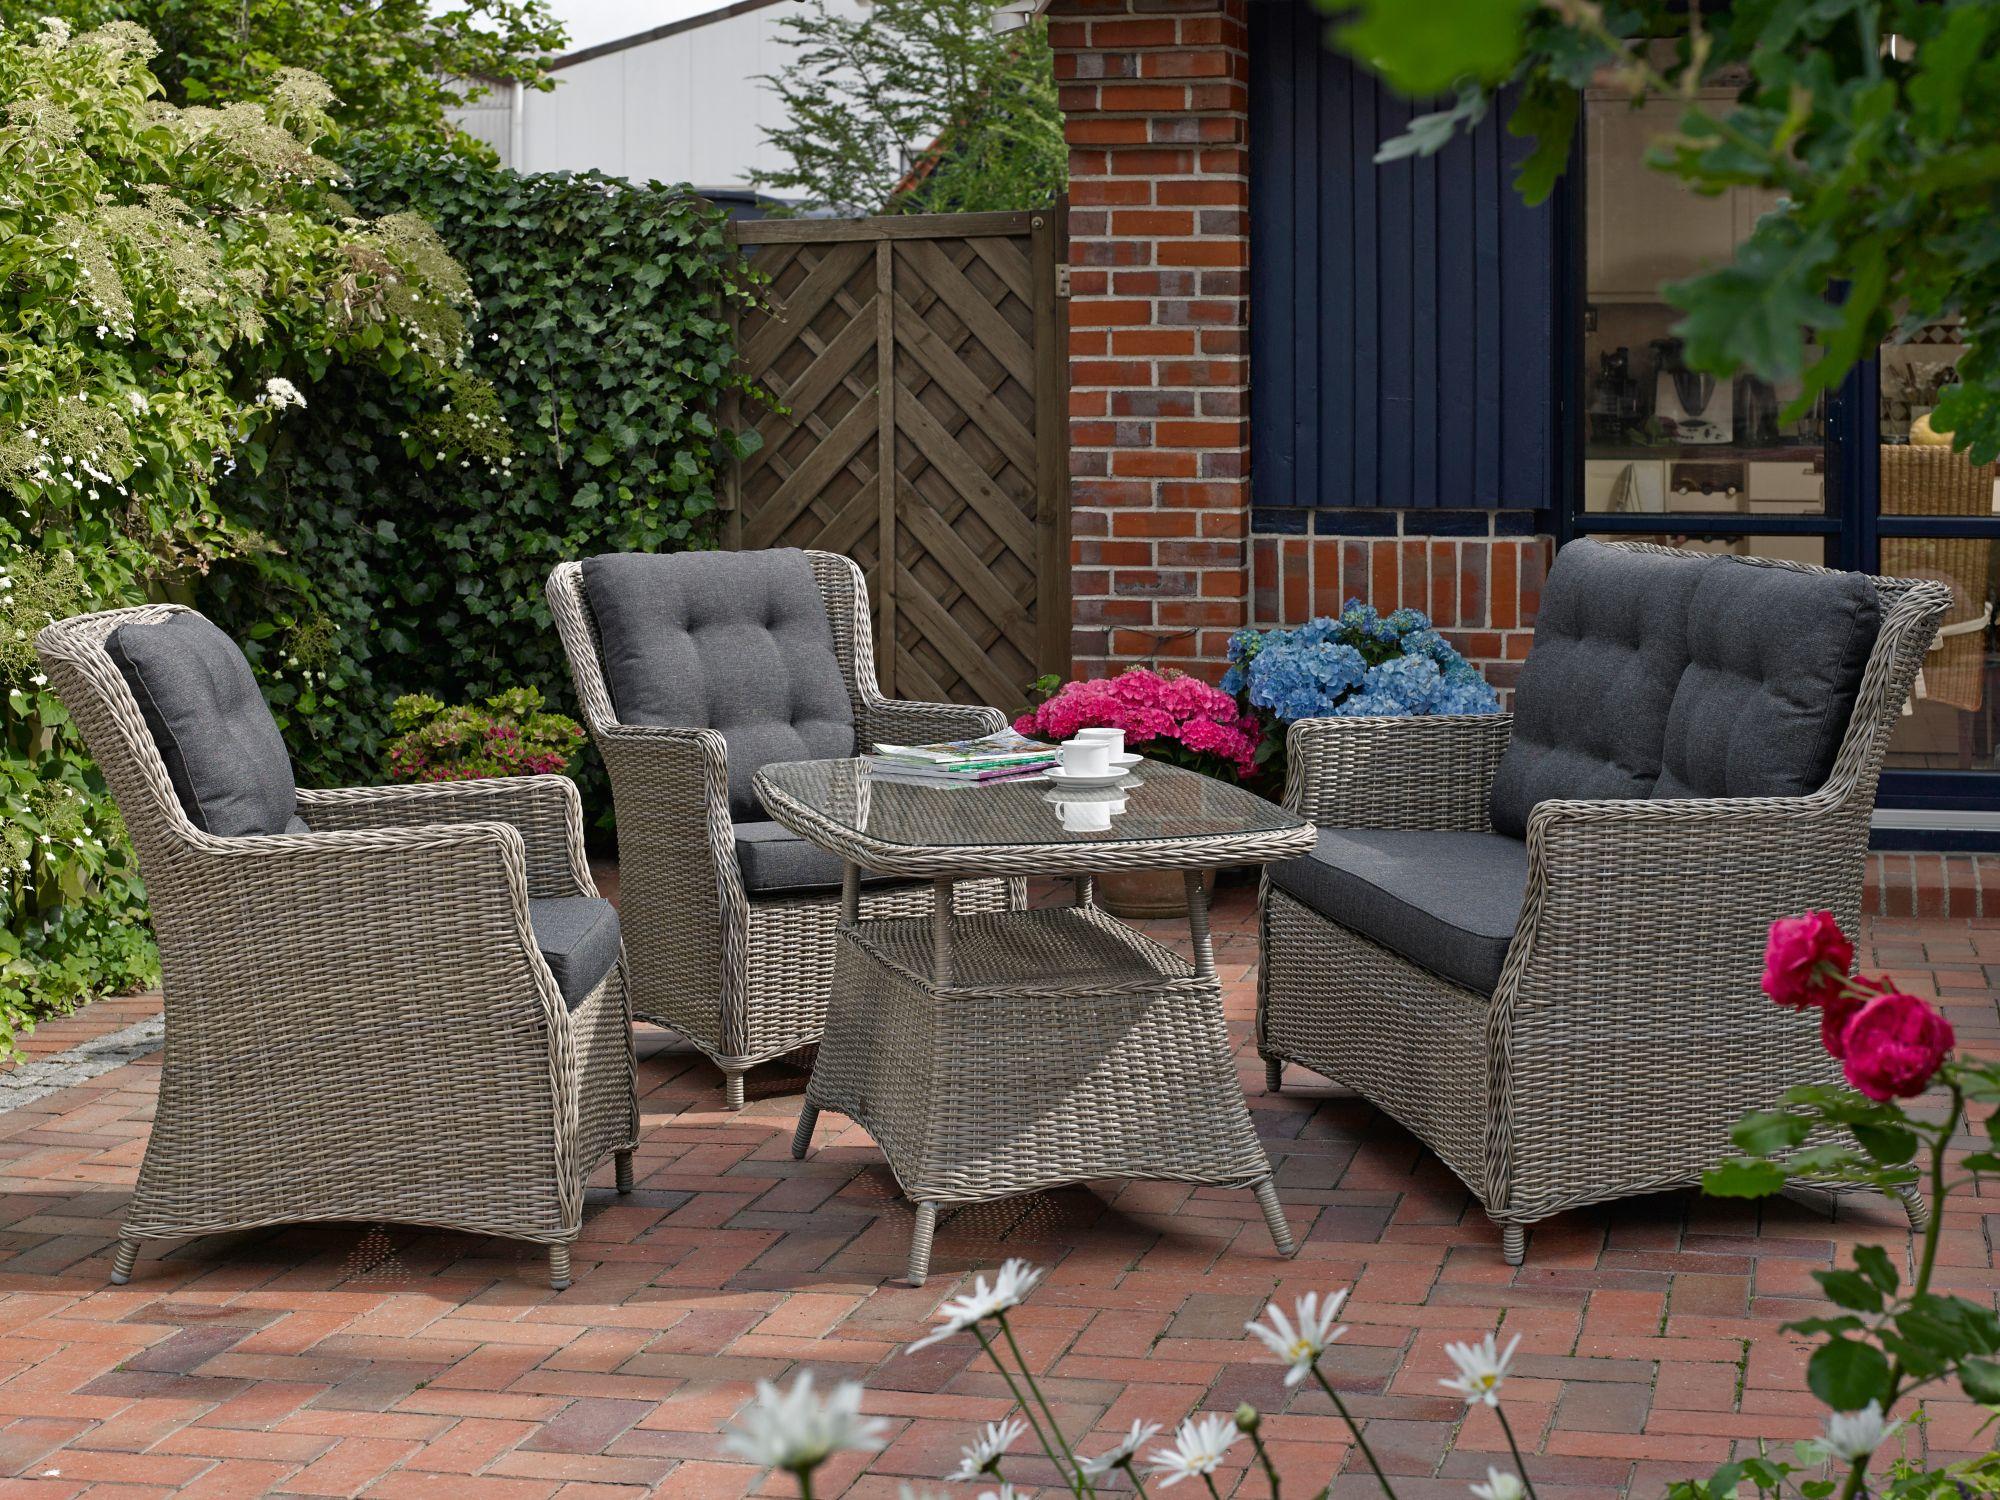 DESTINY  Gartenmöbelset »Casa«, 2 Sessel, 2er-Sofa, Tisch 120x75 cm, Polyrattan, dunkelgrau